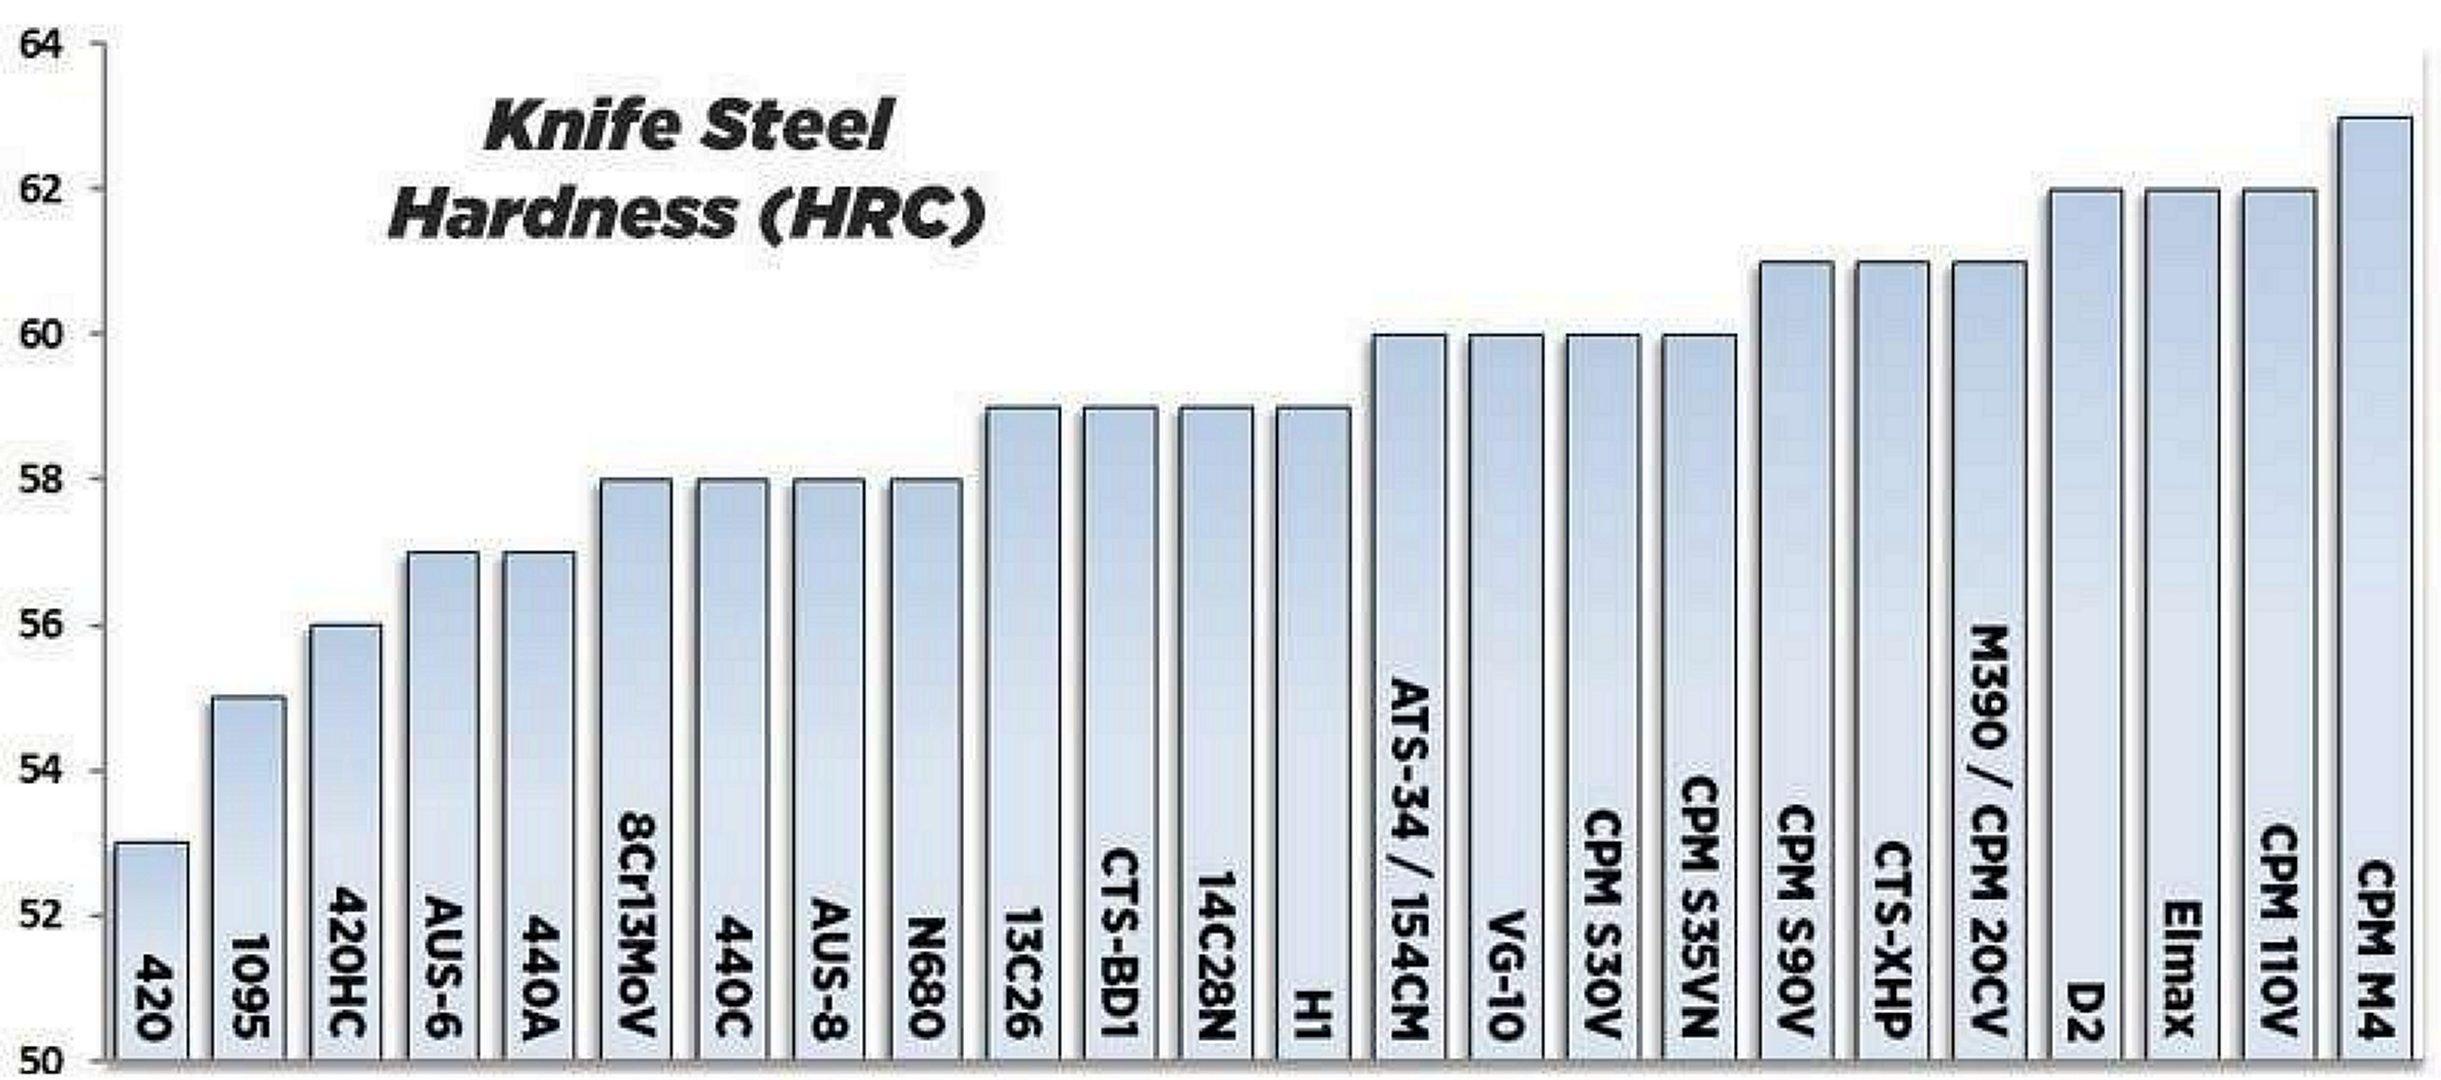 knife steel hardness (HRC)